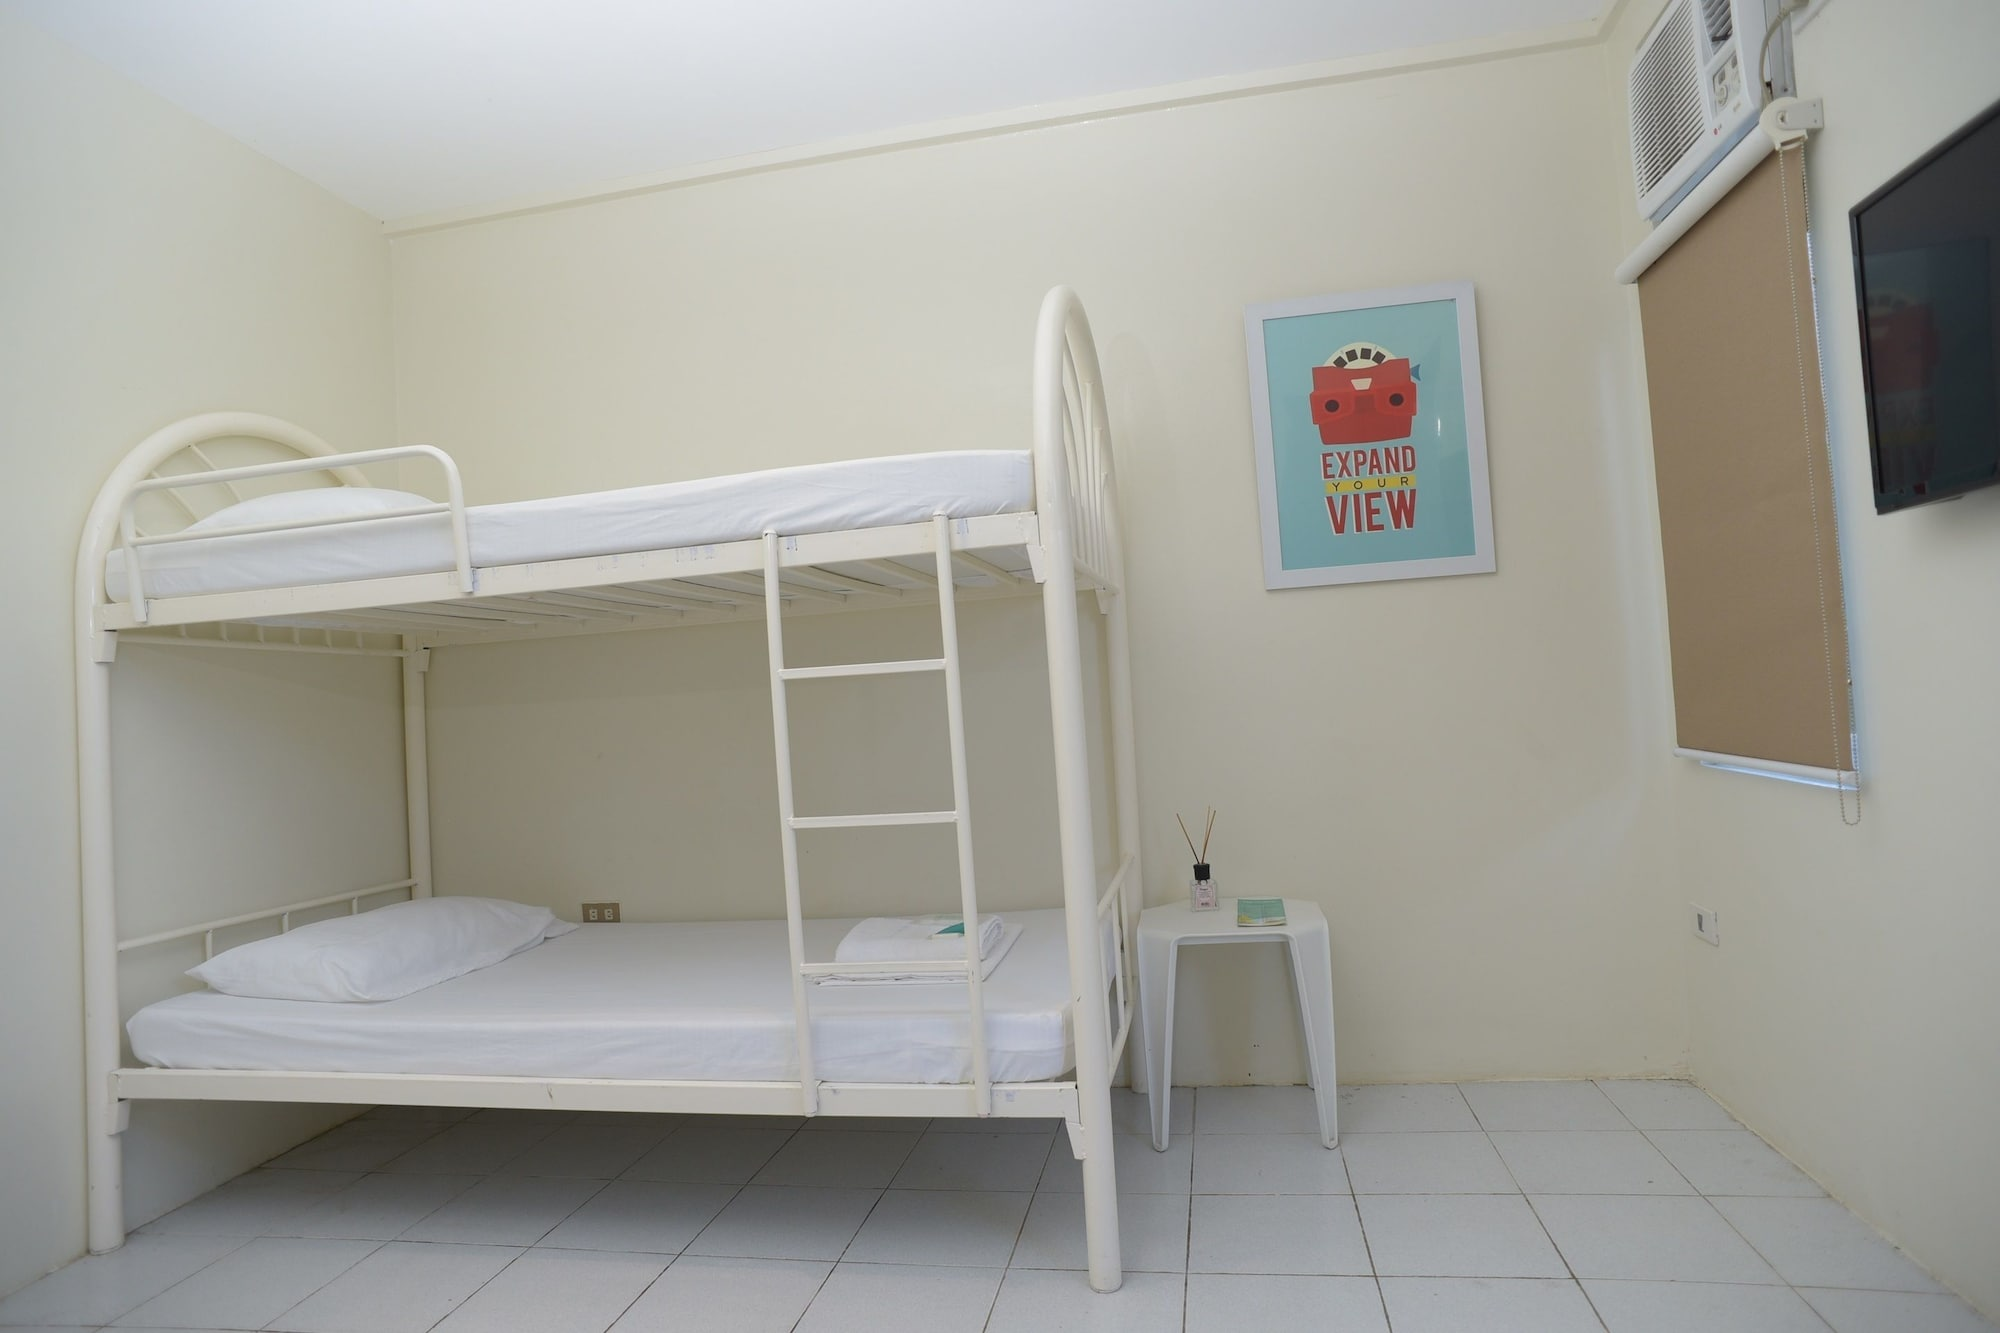 ZEN Rooms Vybe Hotel Laoag, Laoag City